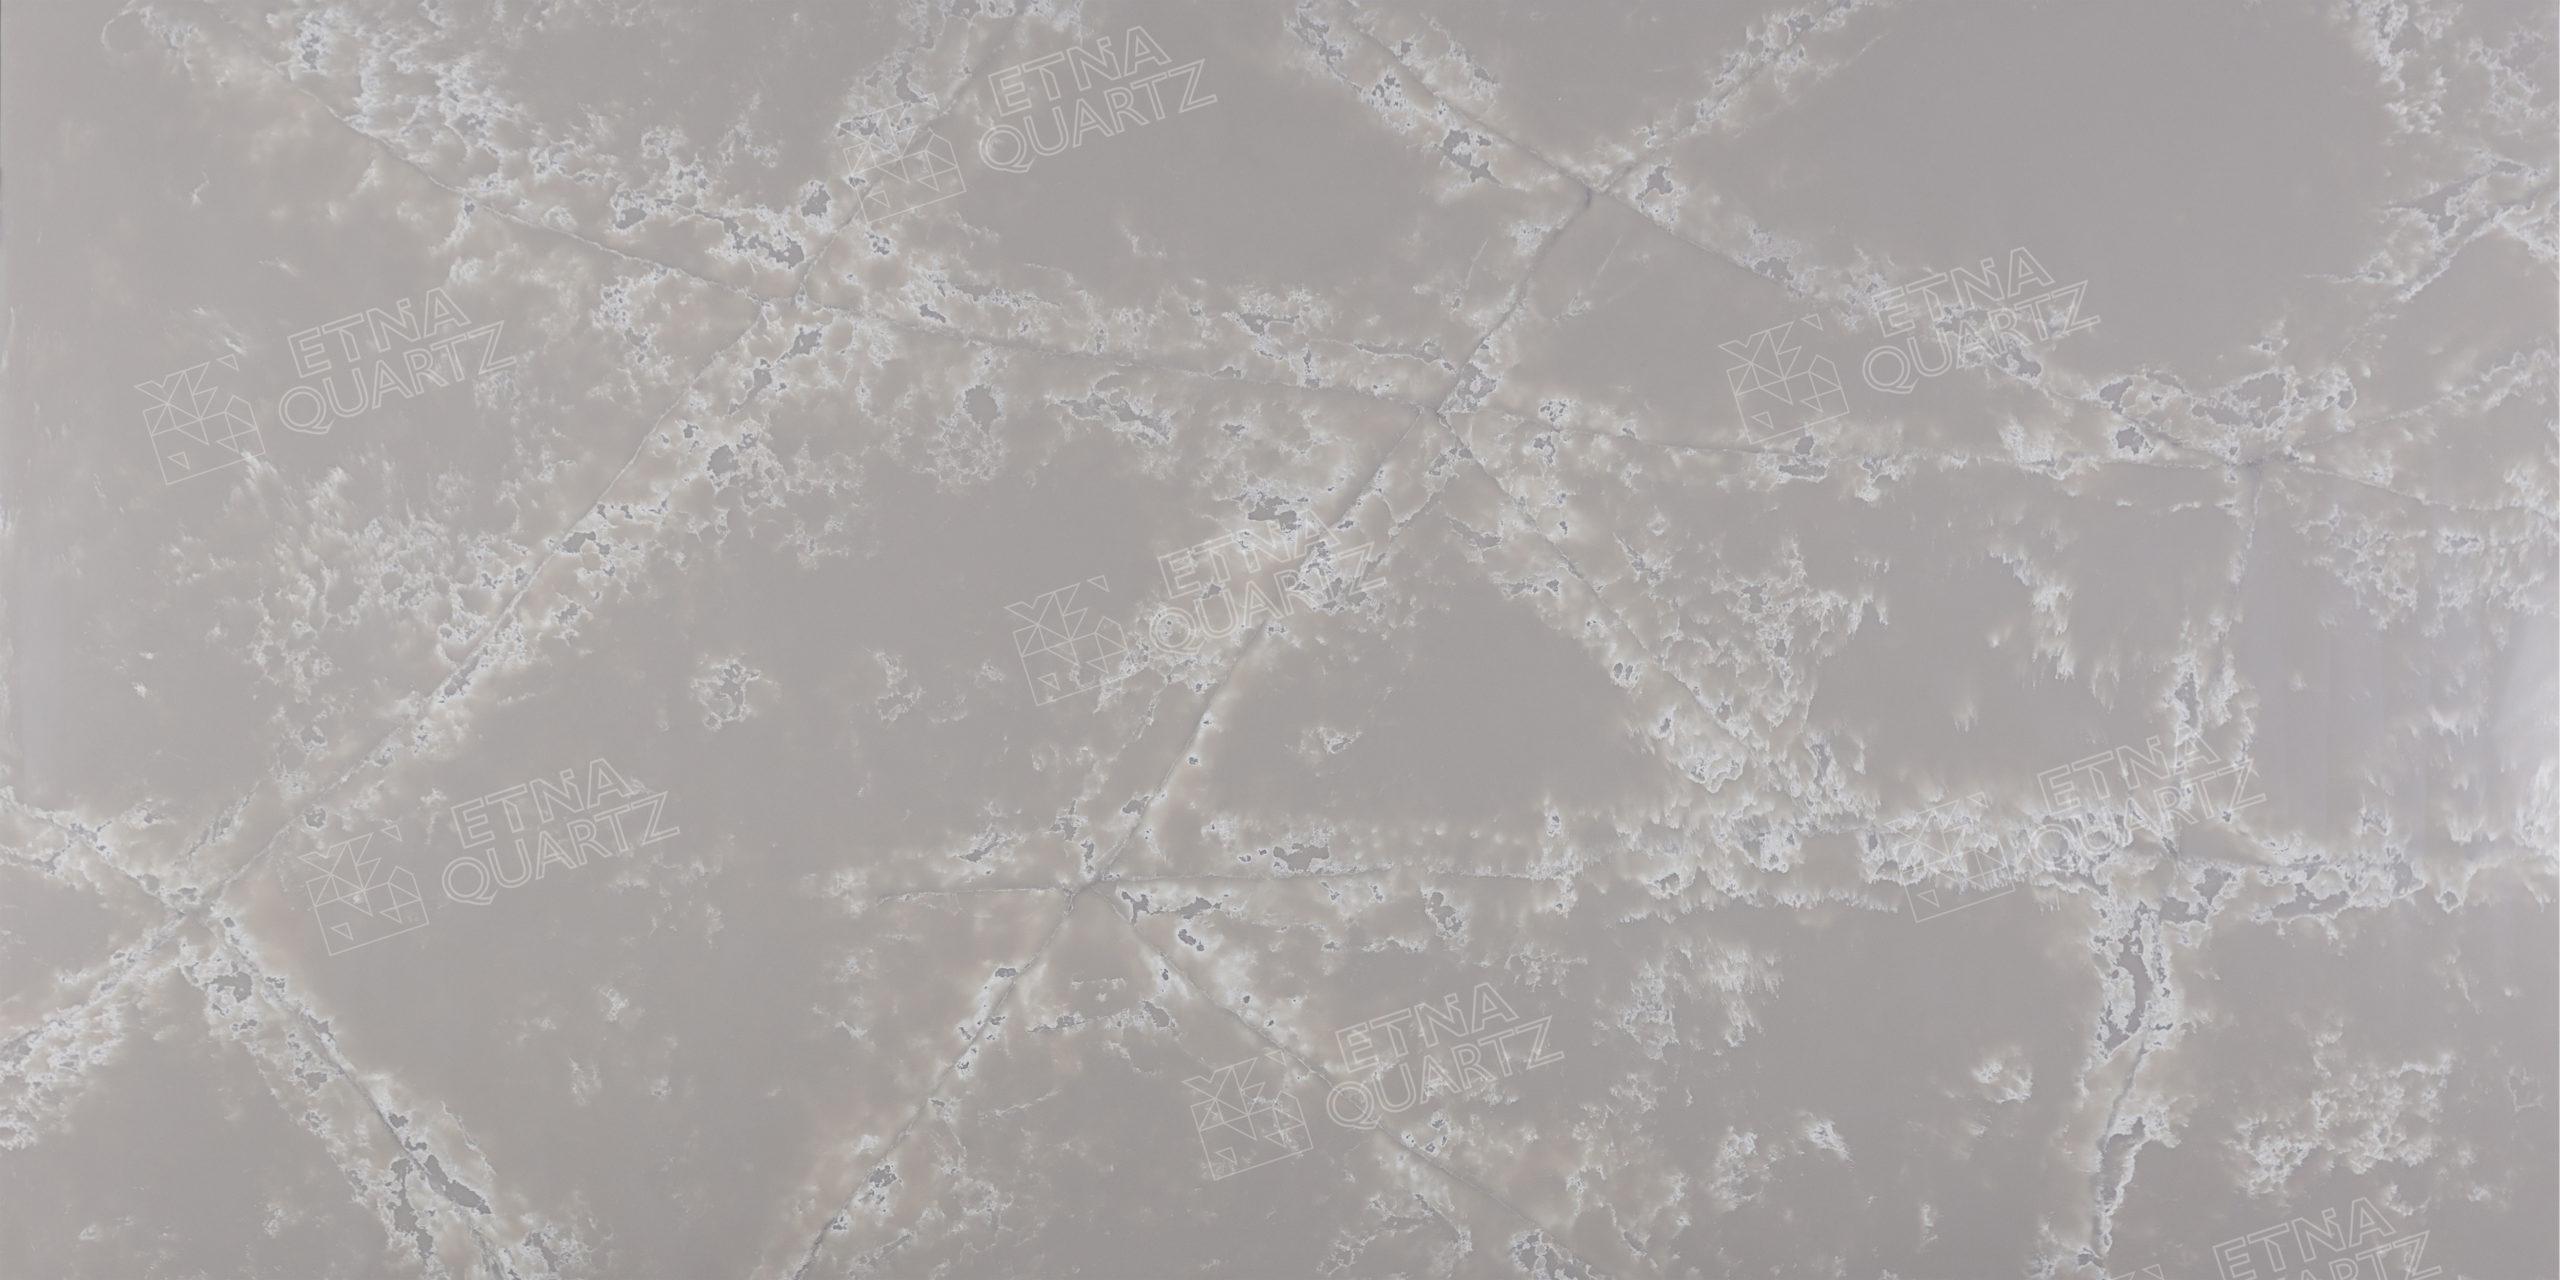 EQPM 023 White Ice